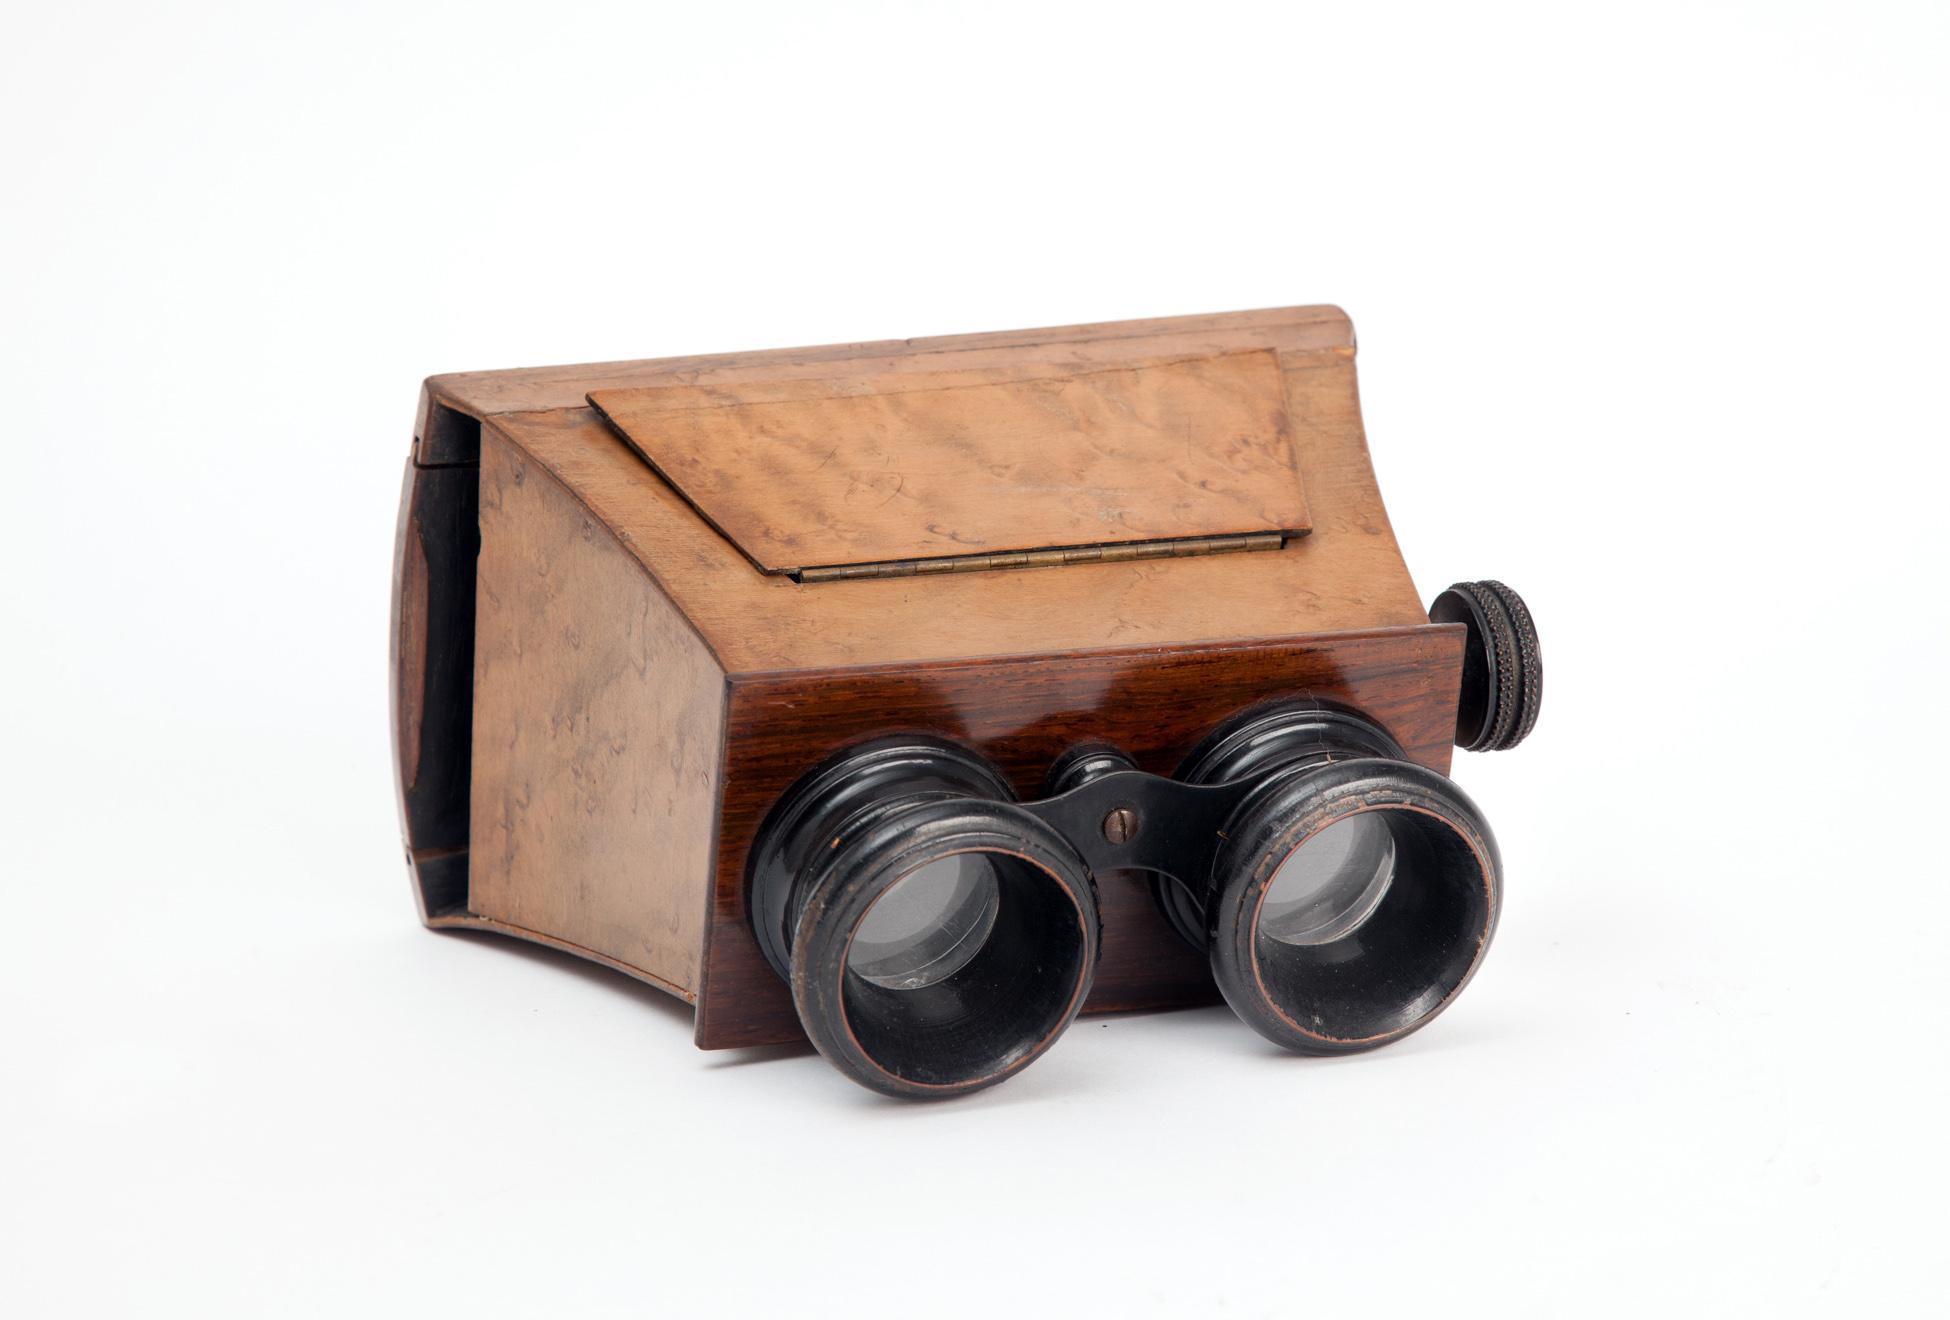 Brewser Stereoscope, 1870, Alessandro Nassiri